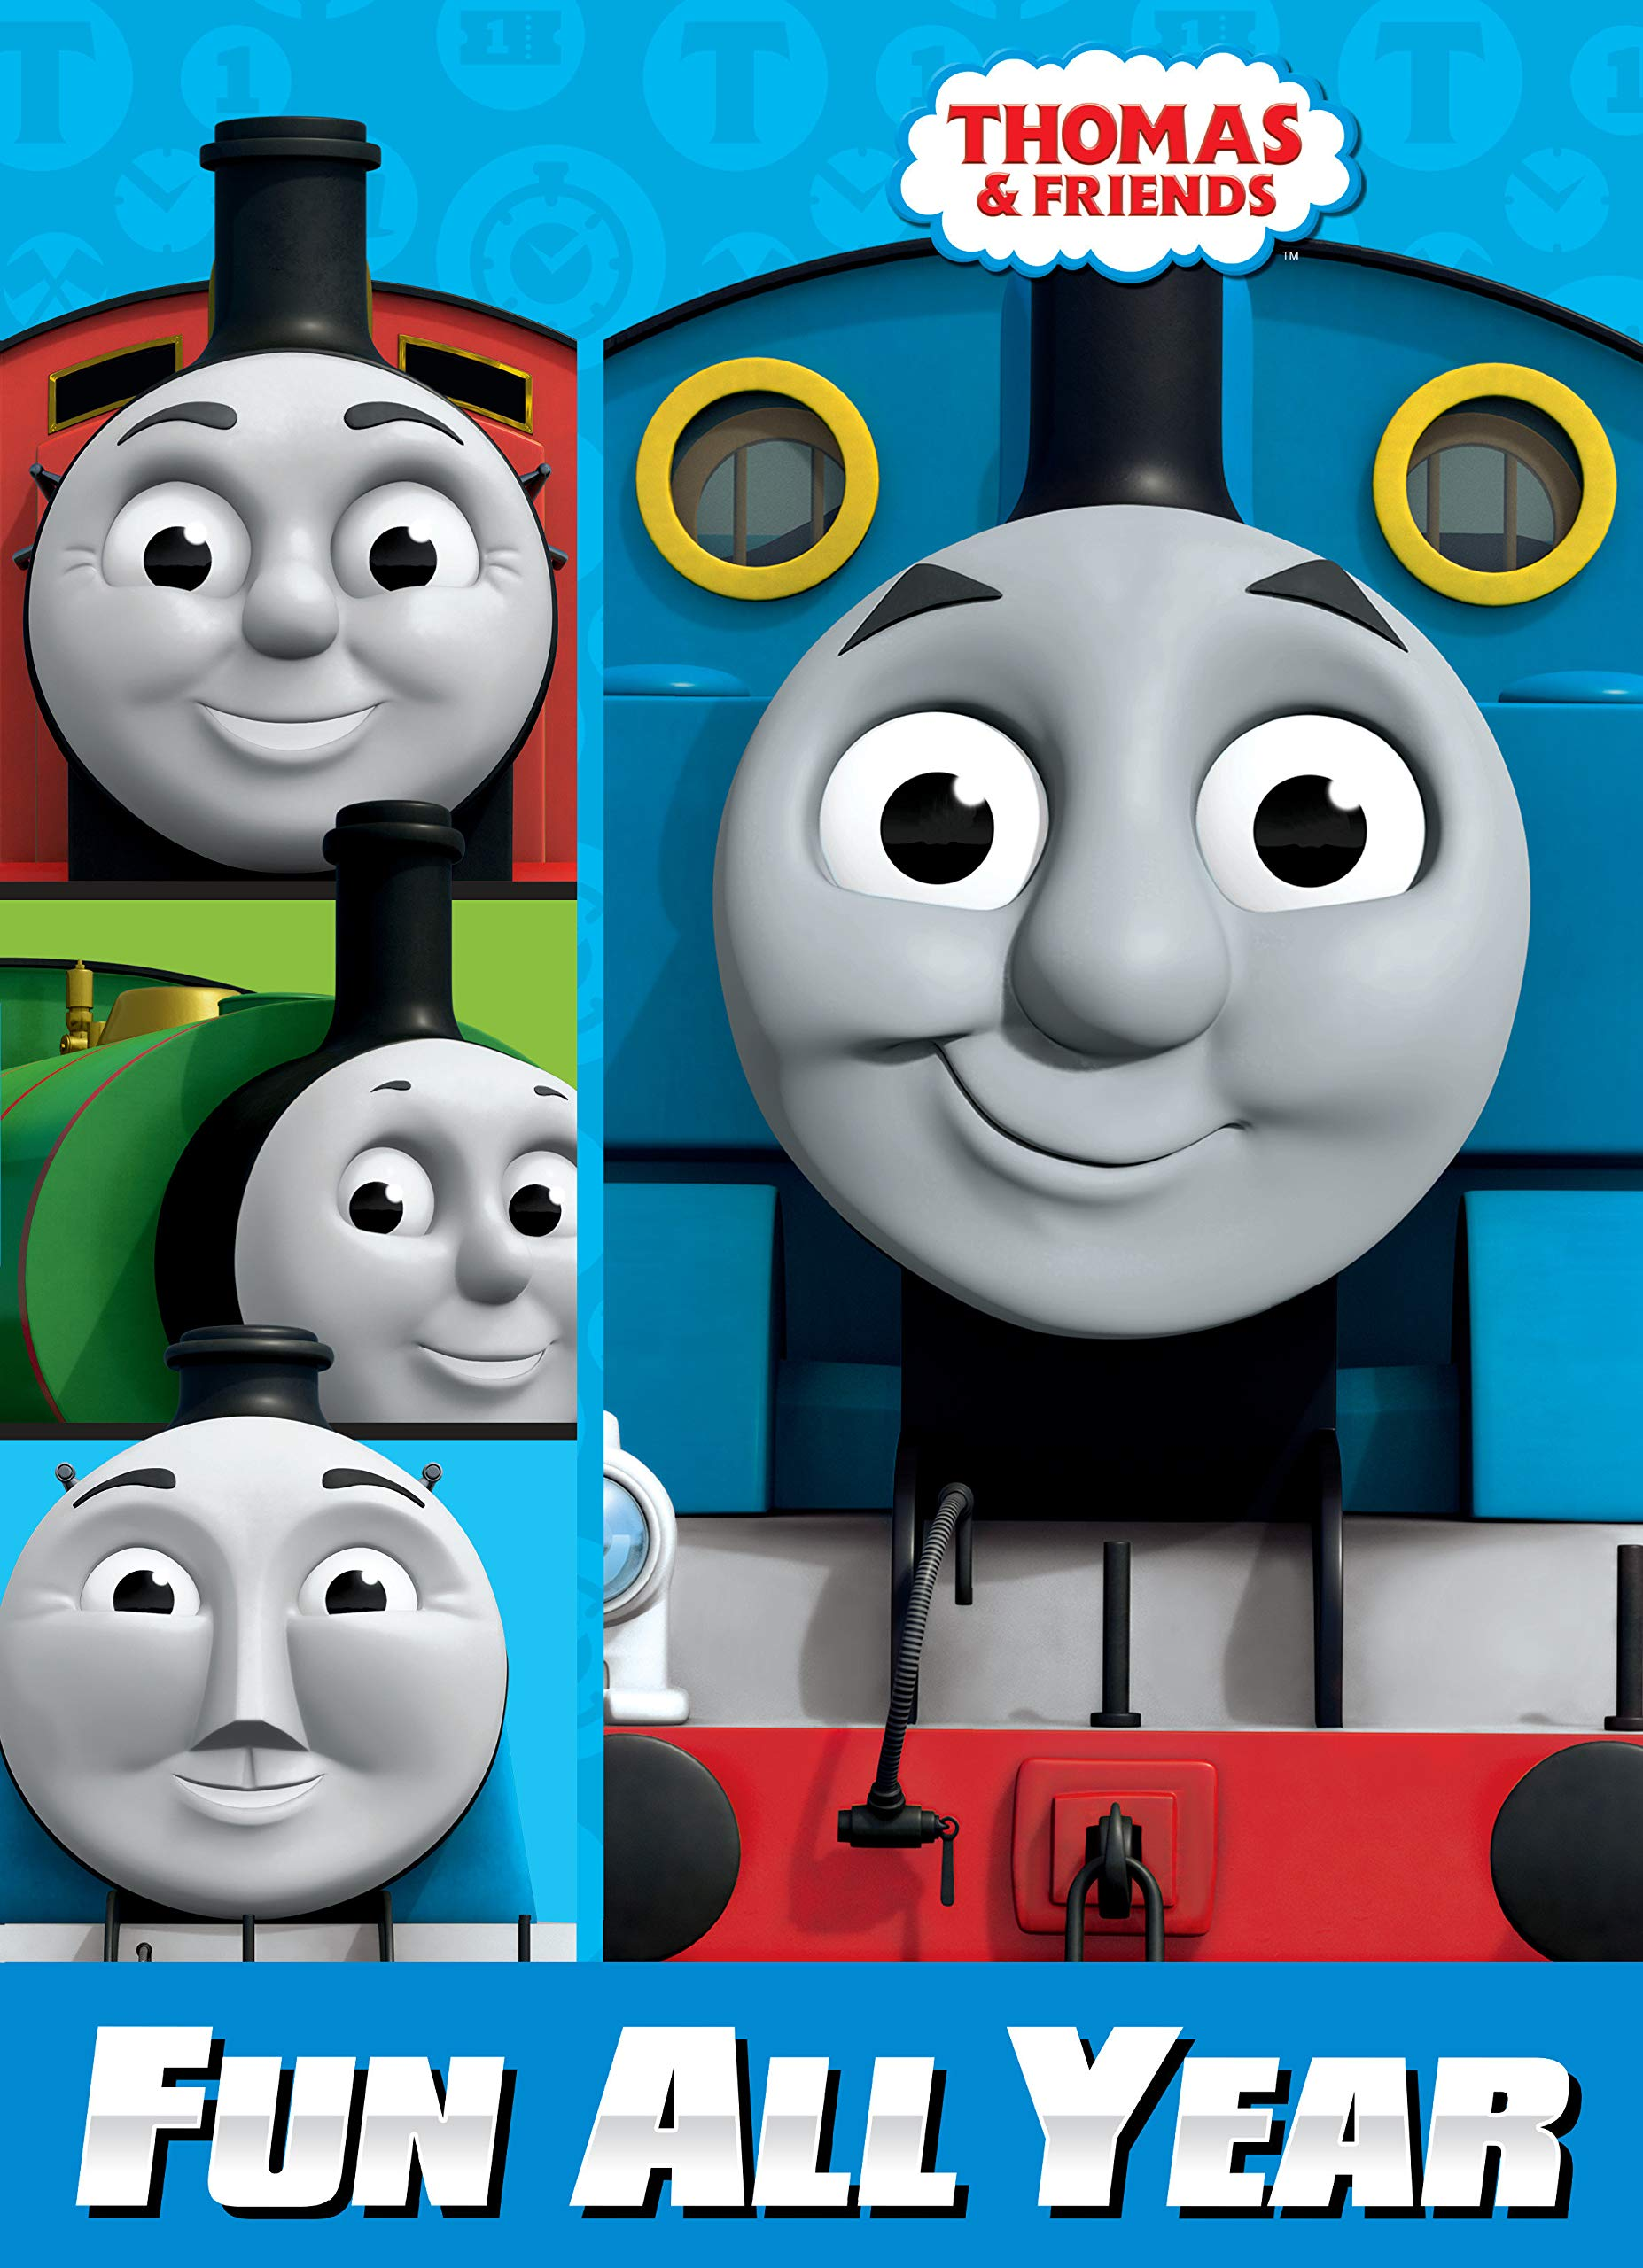 - Fun All Year (Thomas & Friends) (Super Coloring Book): Amazon.co